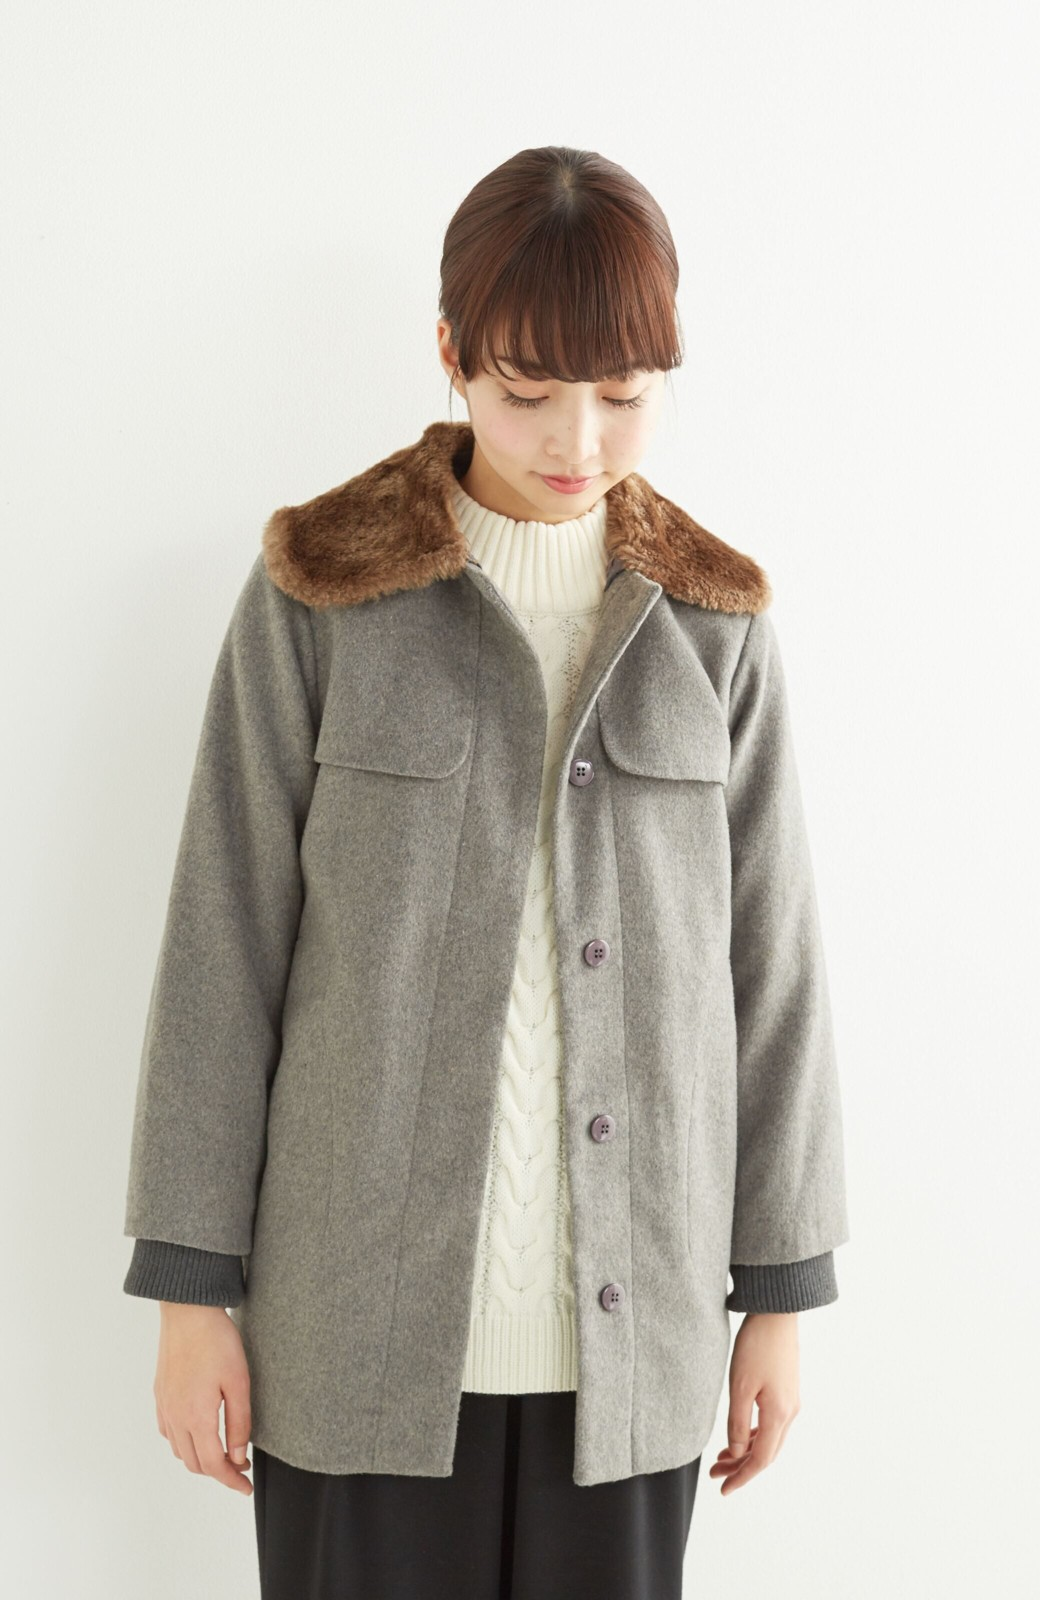 pilvee 取り外しフェイクファー衿付き ウール混のノーカラーコート <グレー>の商品写真12